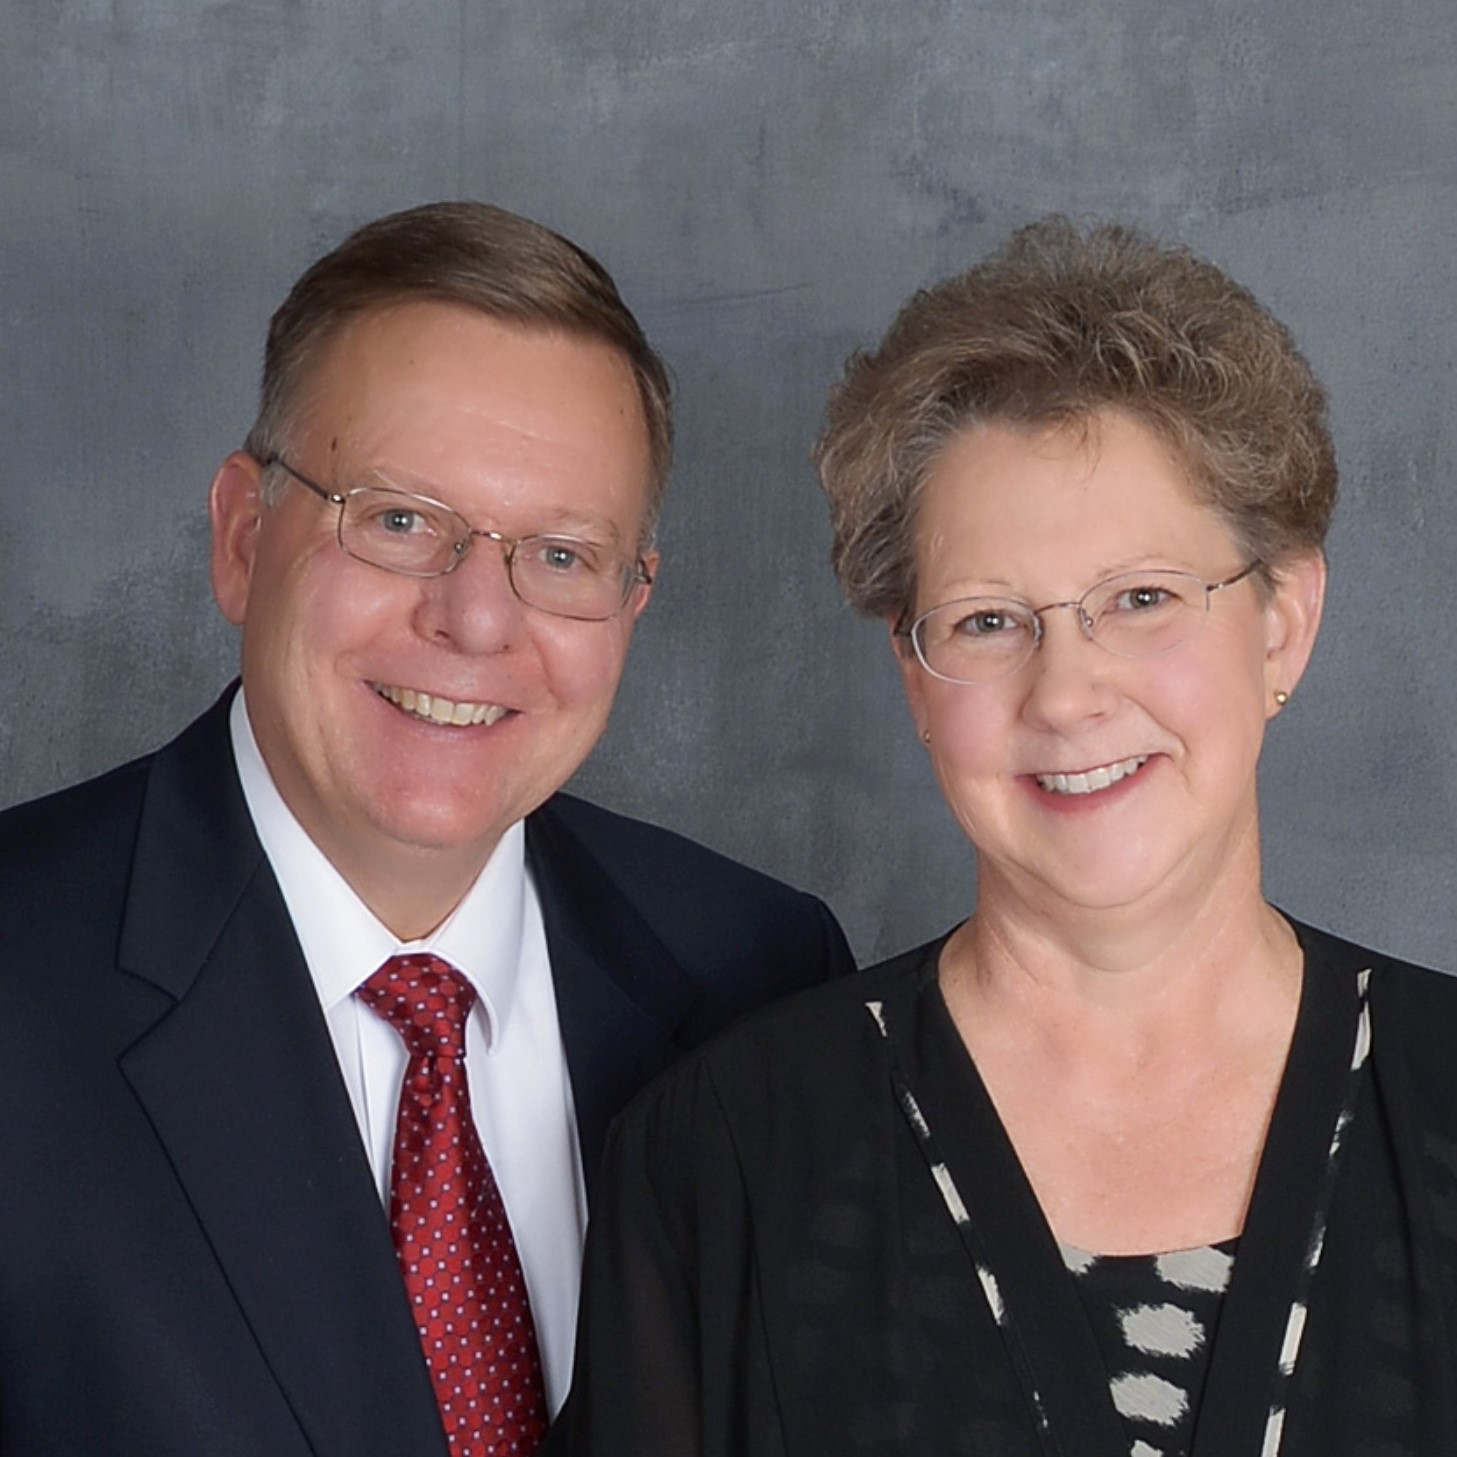 D. Corey and Melissa C. Sanders